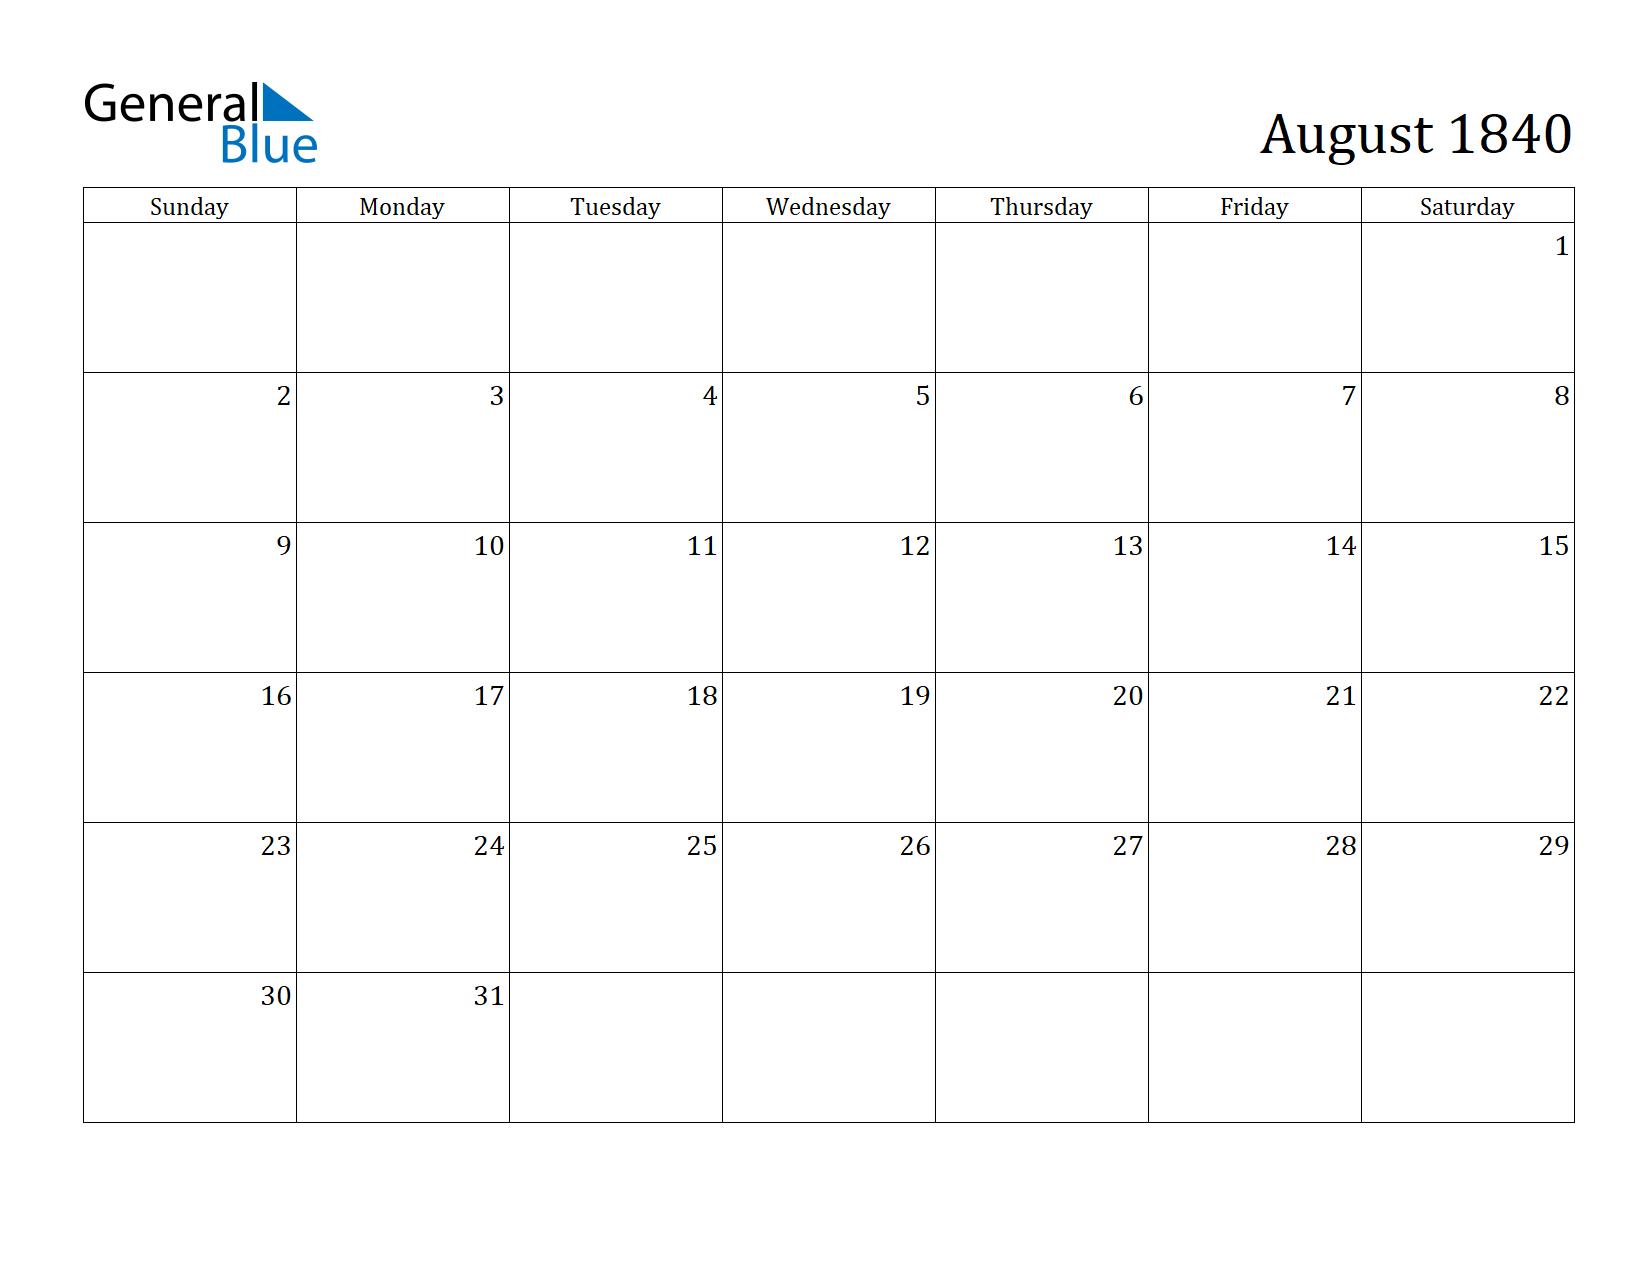 Image of August 1840 Calendar